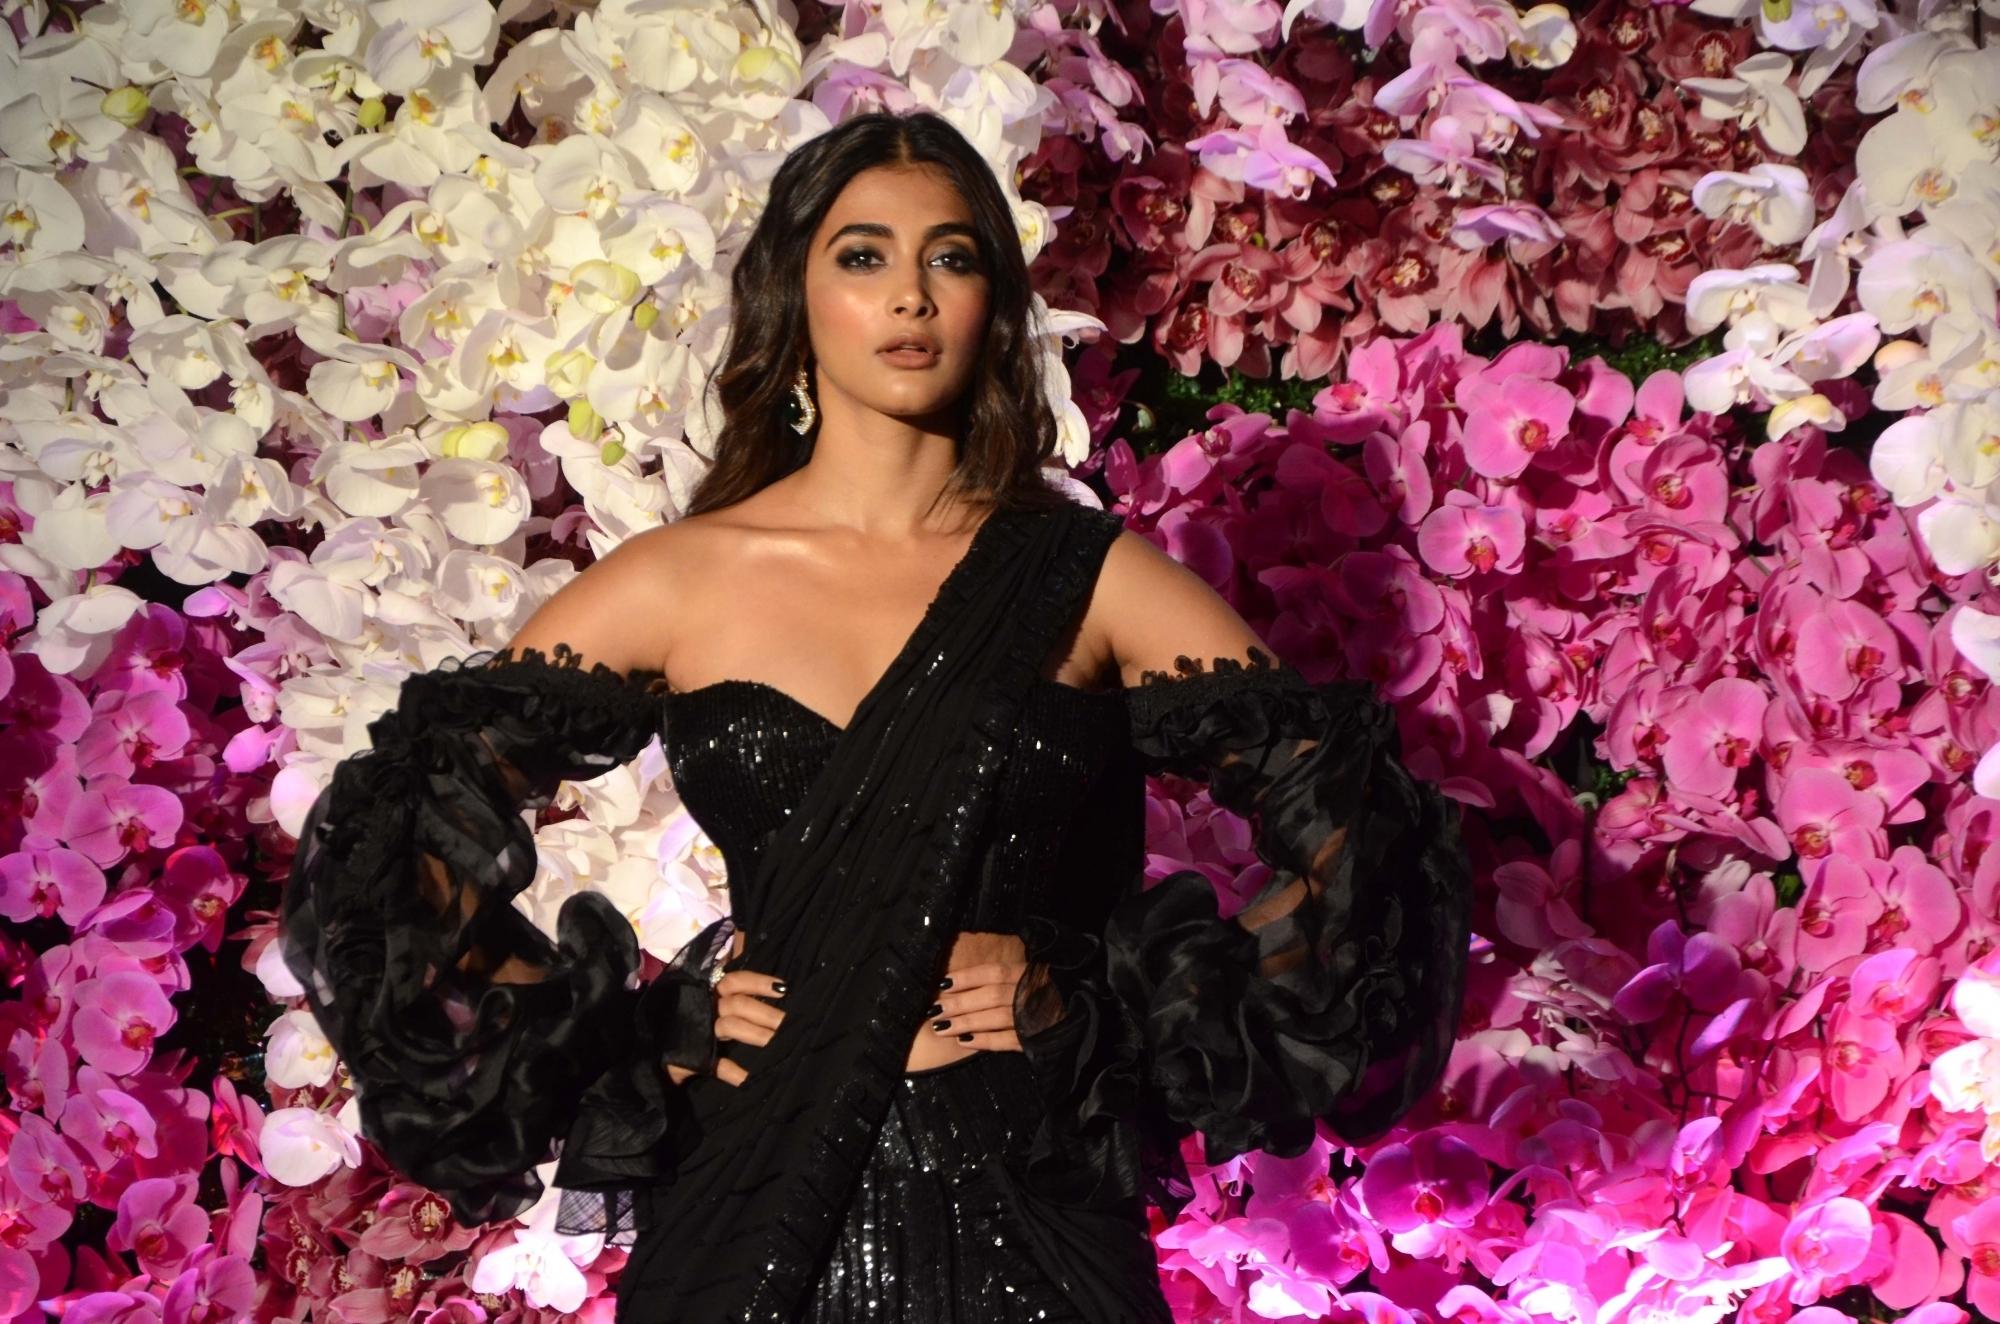 Actress Pooja Hegde at the wedding reception of Akash Ambani and Shloka Mehta in Mumbai